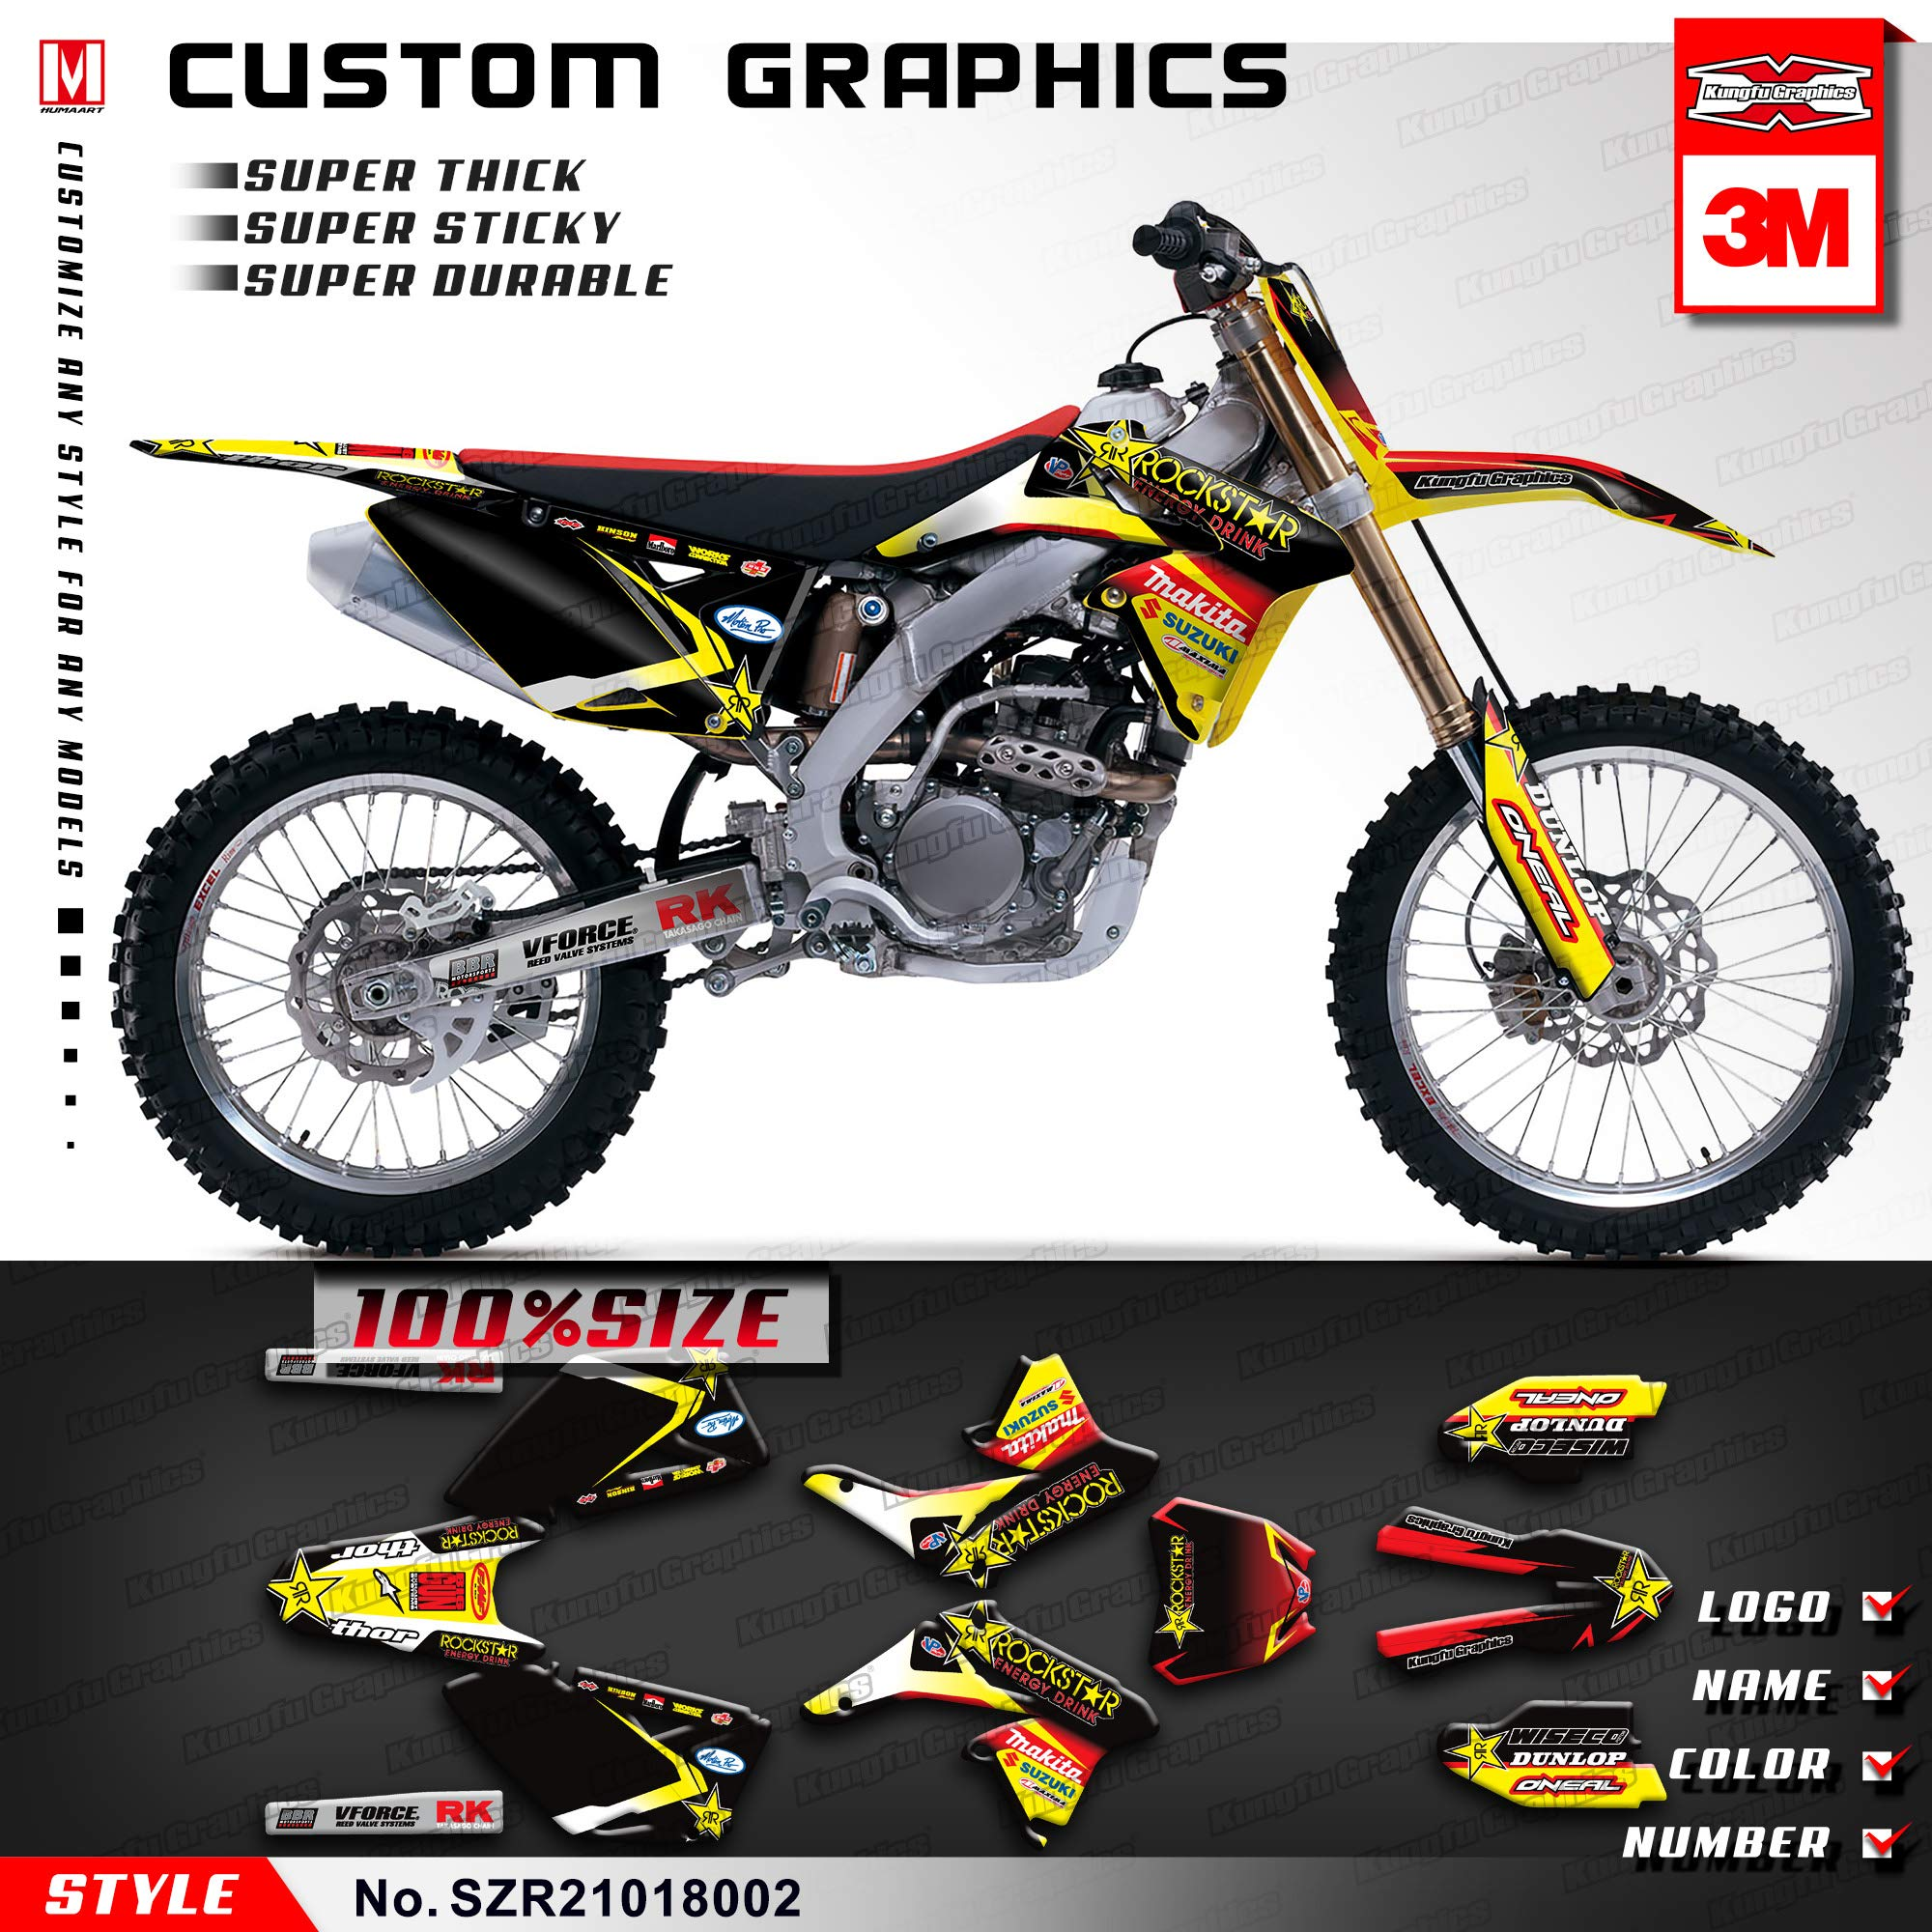 Kungfu Graphics Custom Decal Kit for Suzuki RMZ 250 2010 2011 2012 2013 2014 2015 2016 2017 2018, Black Yellow, SZR21018002